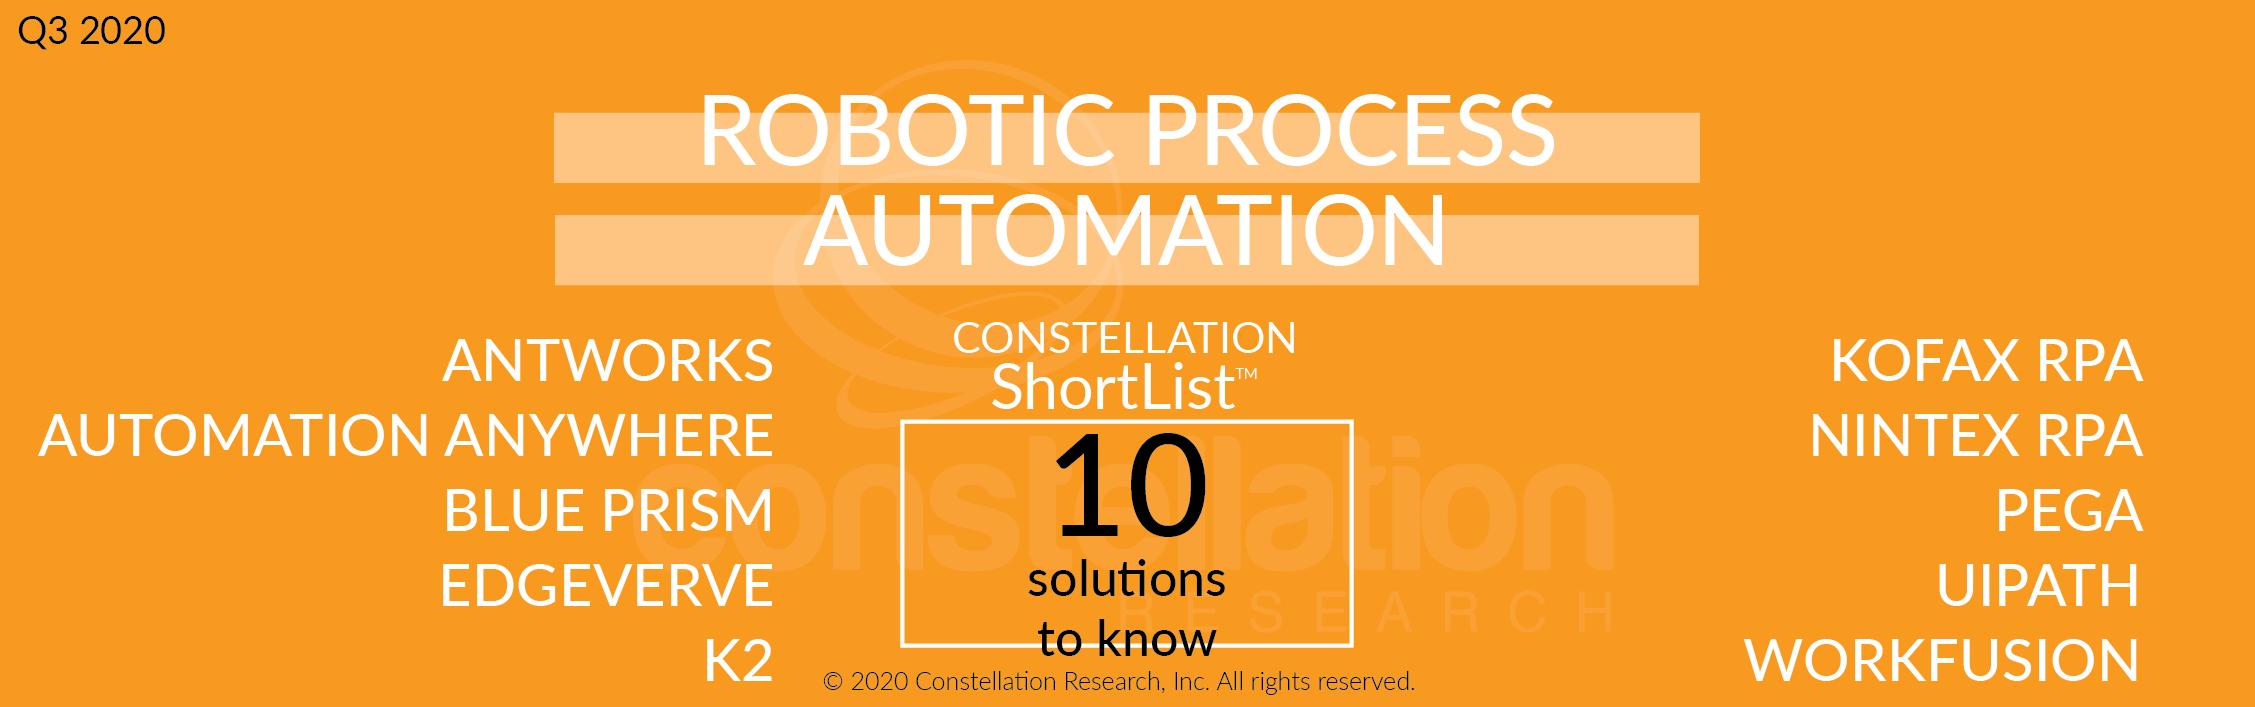 Constellation ShortList™ Robotic Process Automation